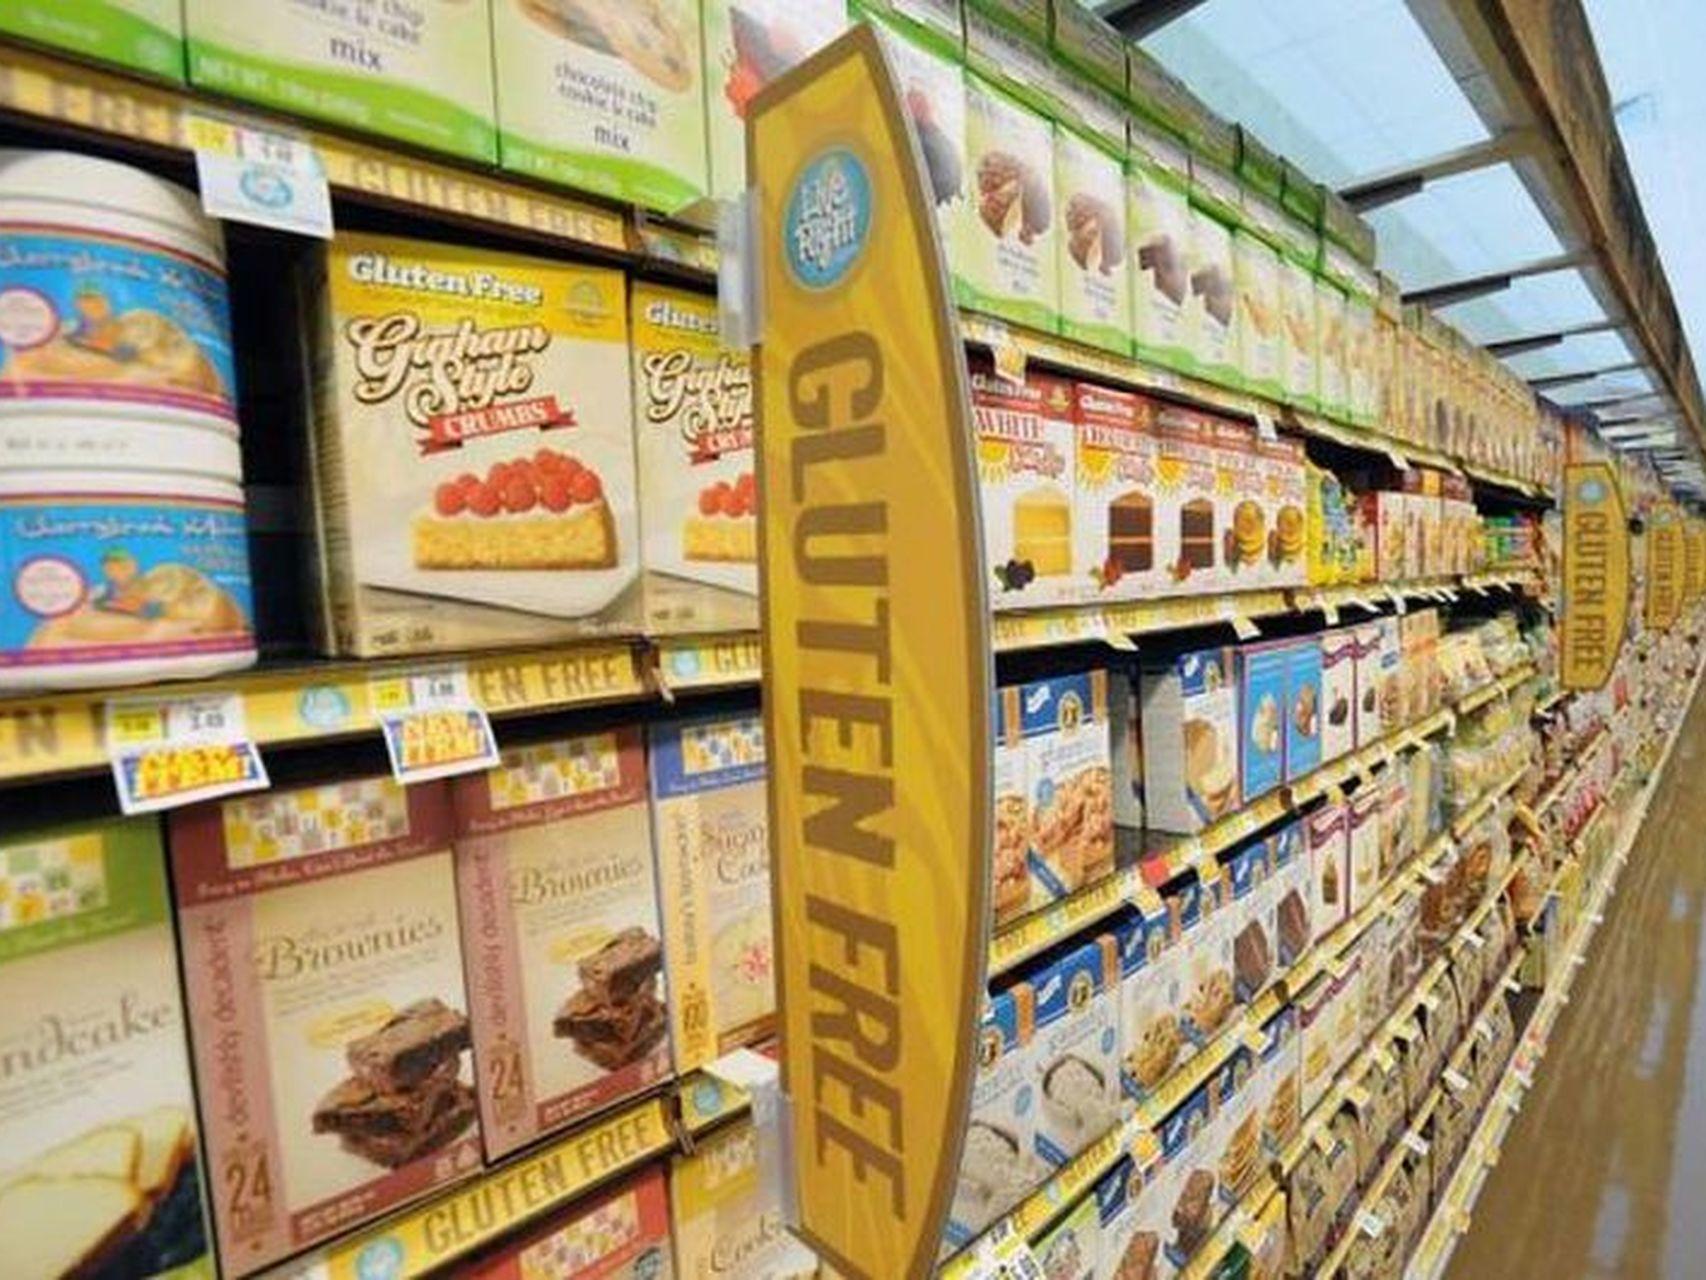 Estante de un supermercado con alimentos sin gluten